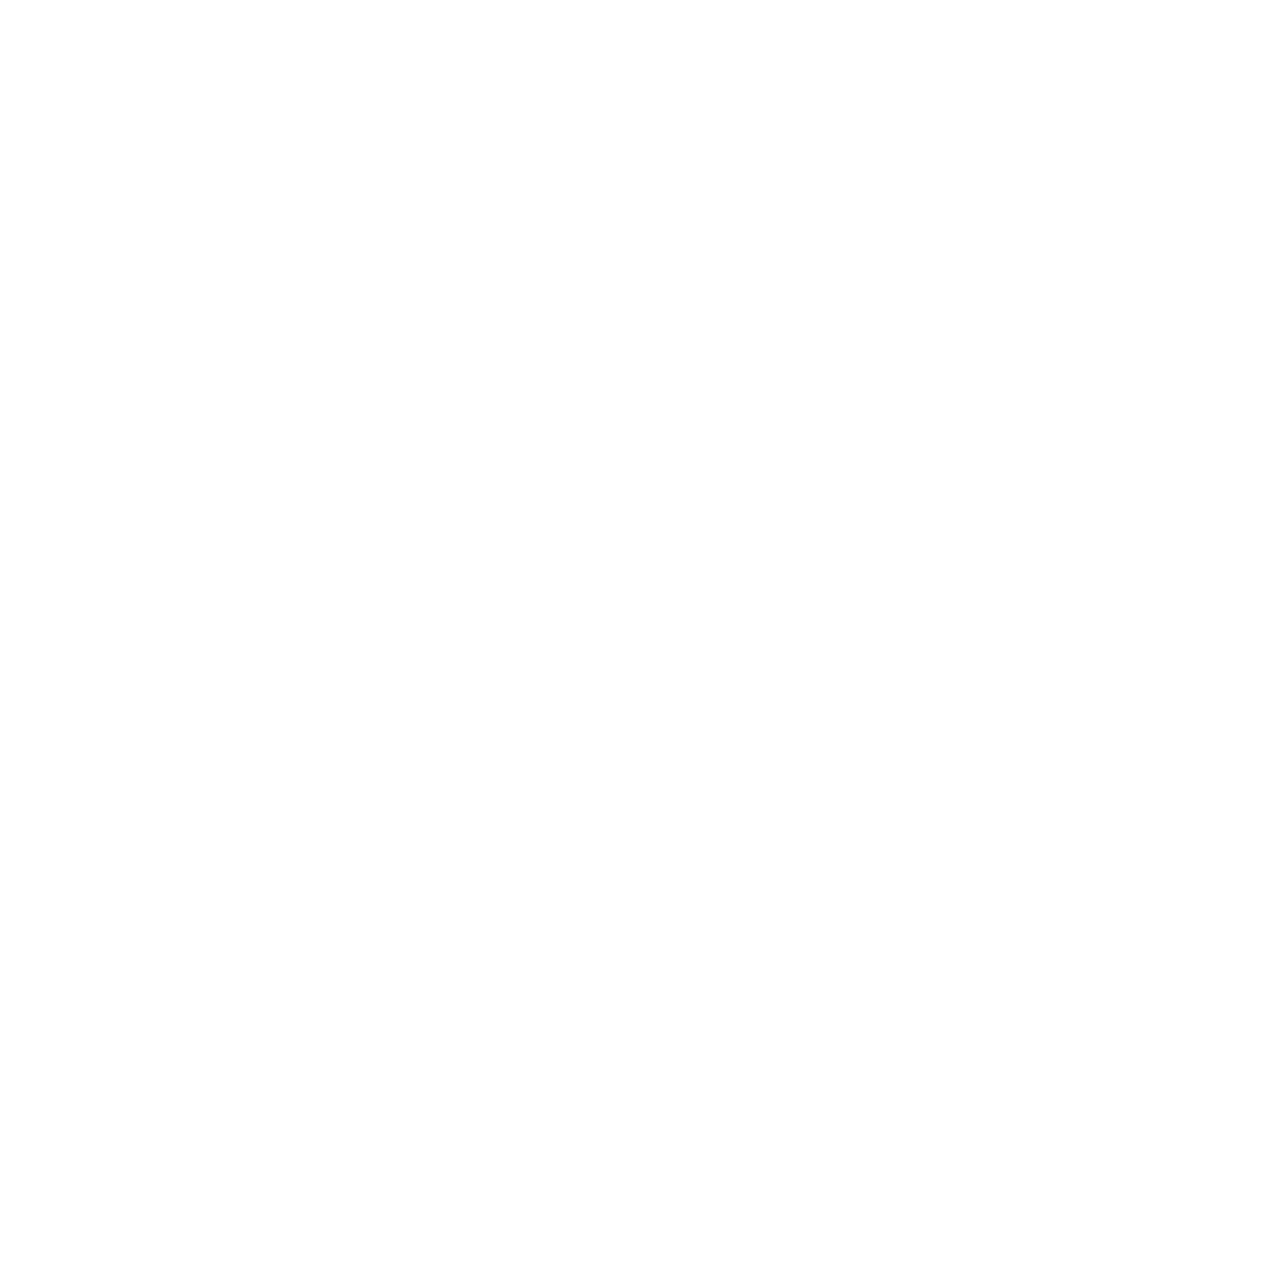 202002 BartolomeoLaunches2020 Stamp White